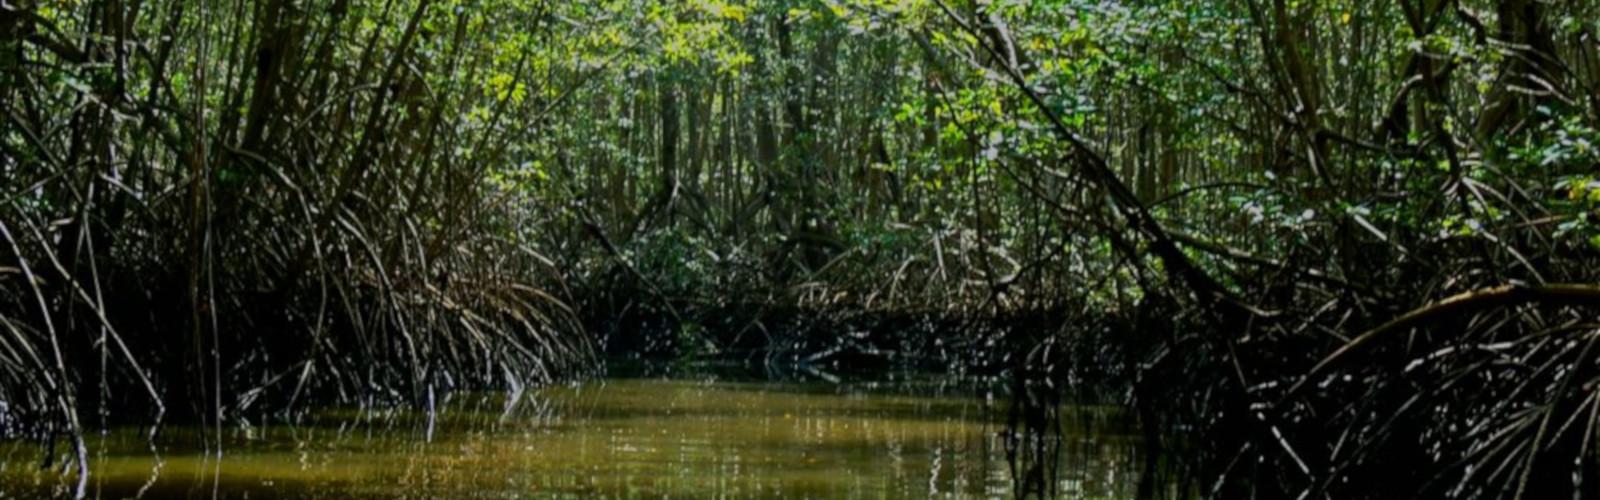 Tamarindo Mangrove Estuary Boat Tour - Native's Way Costa Rica - Tamarindo Transfers and Tours